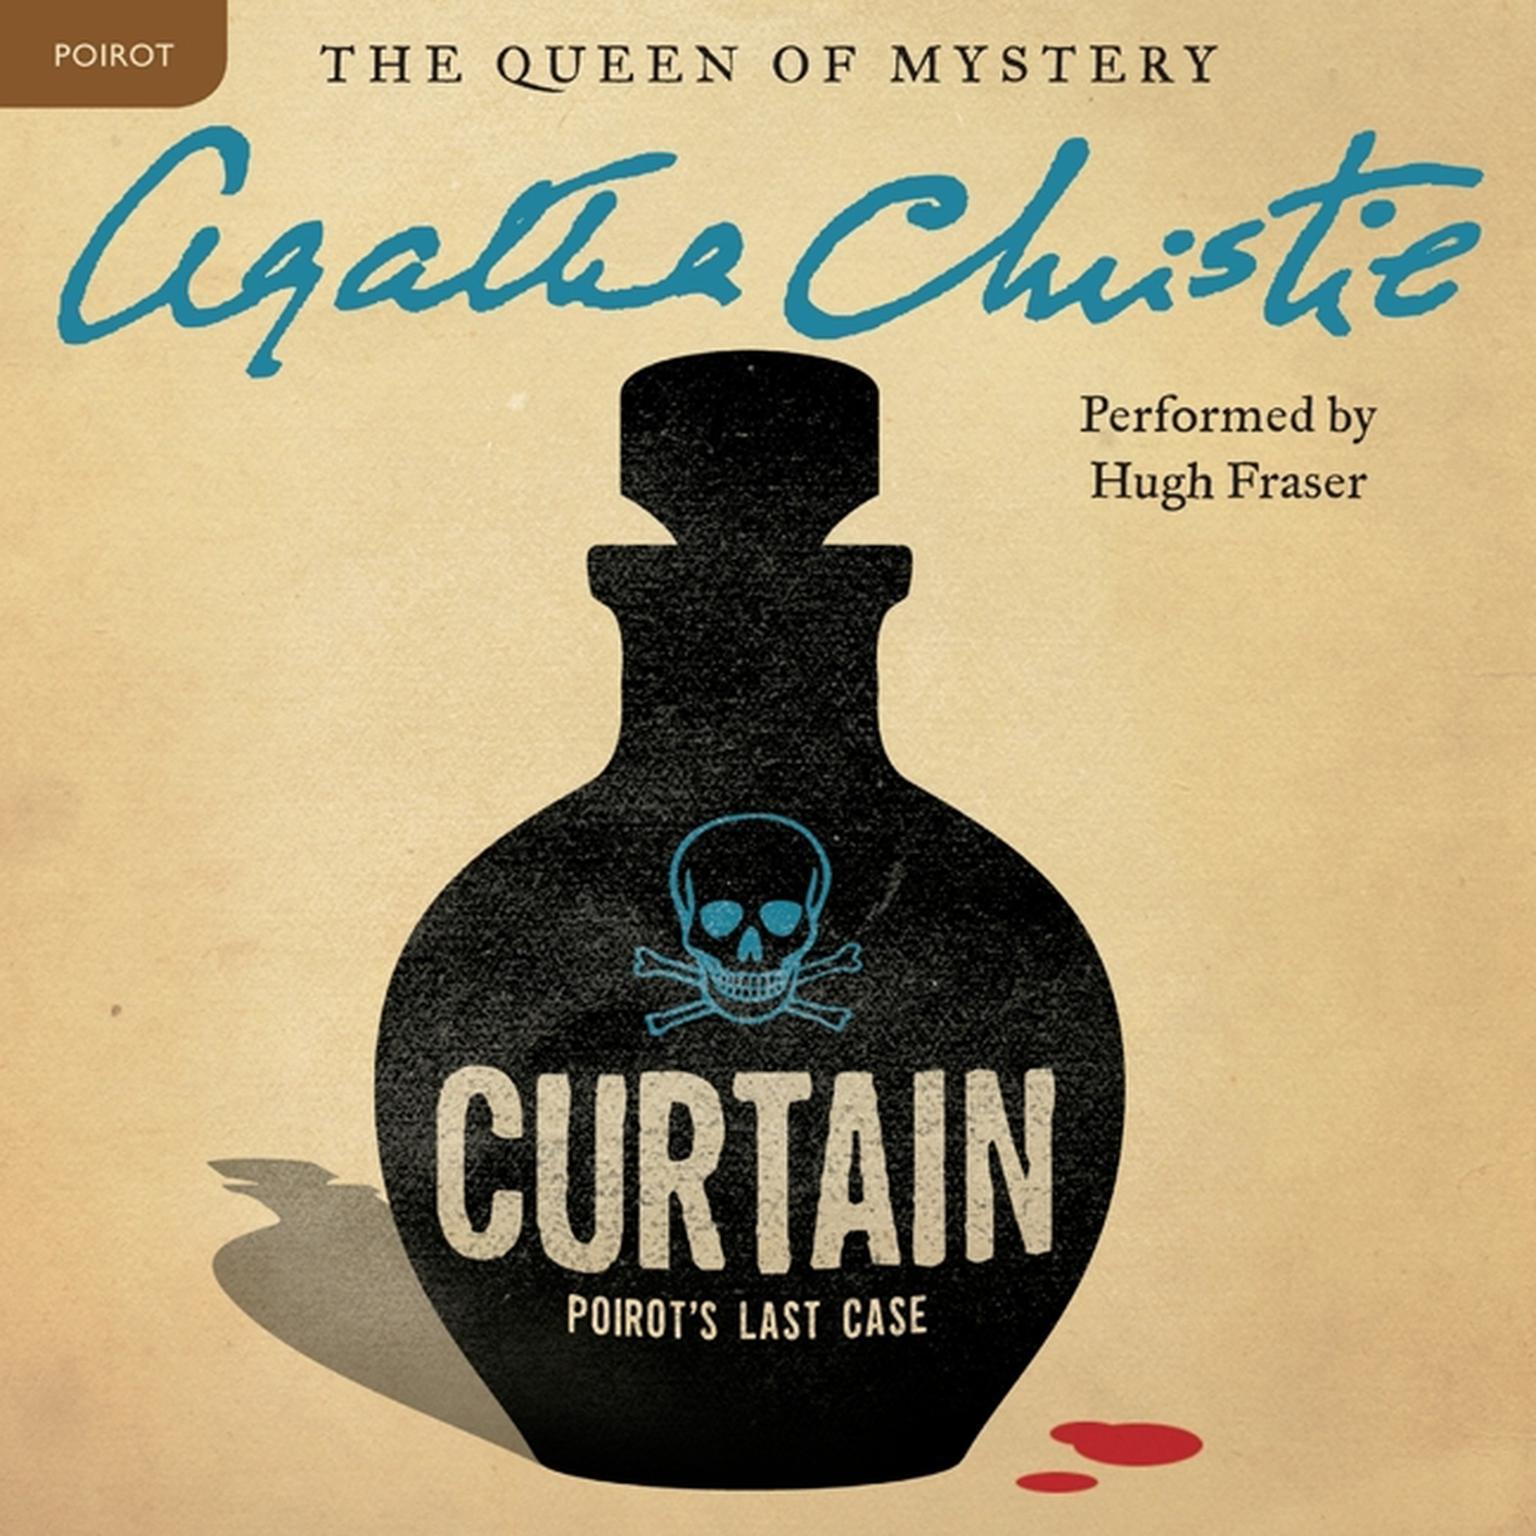 Curtain: Poirots Last Case: A Hercule Poirot Mystery Audiobook, by Agatha Christie